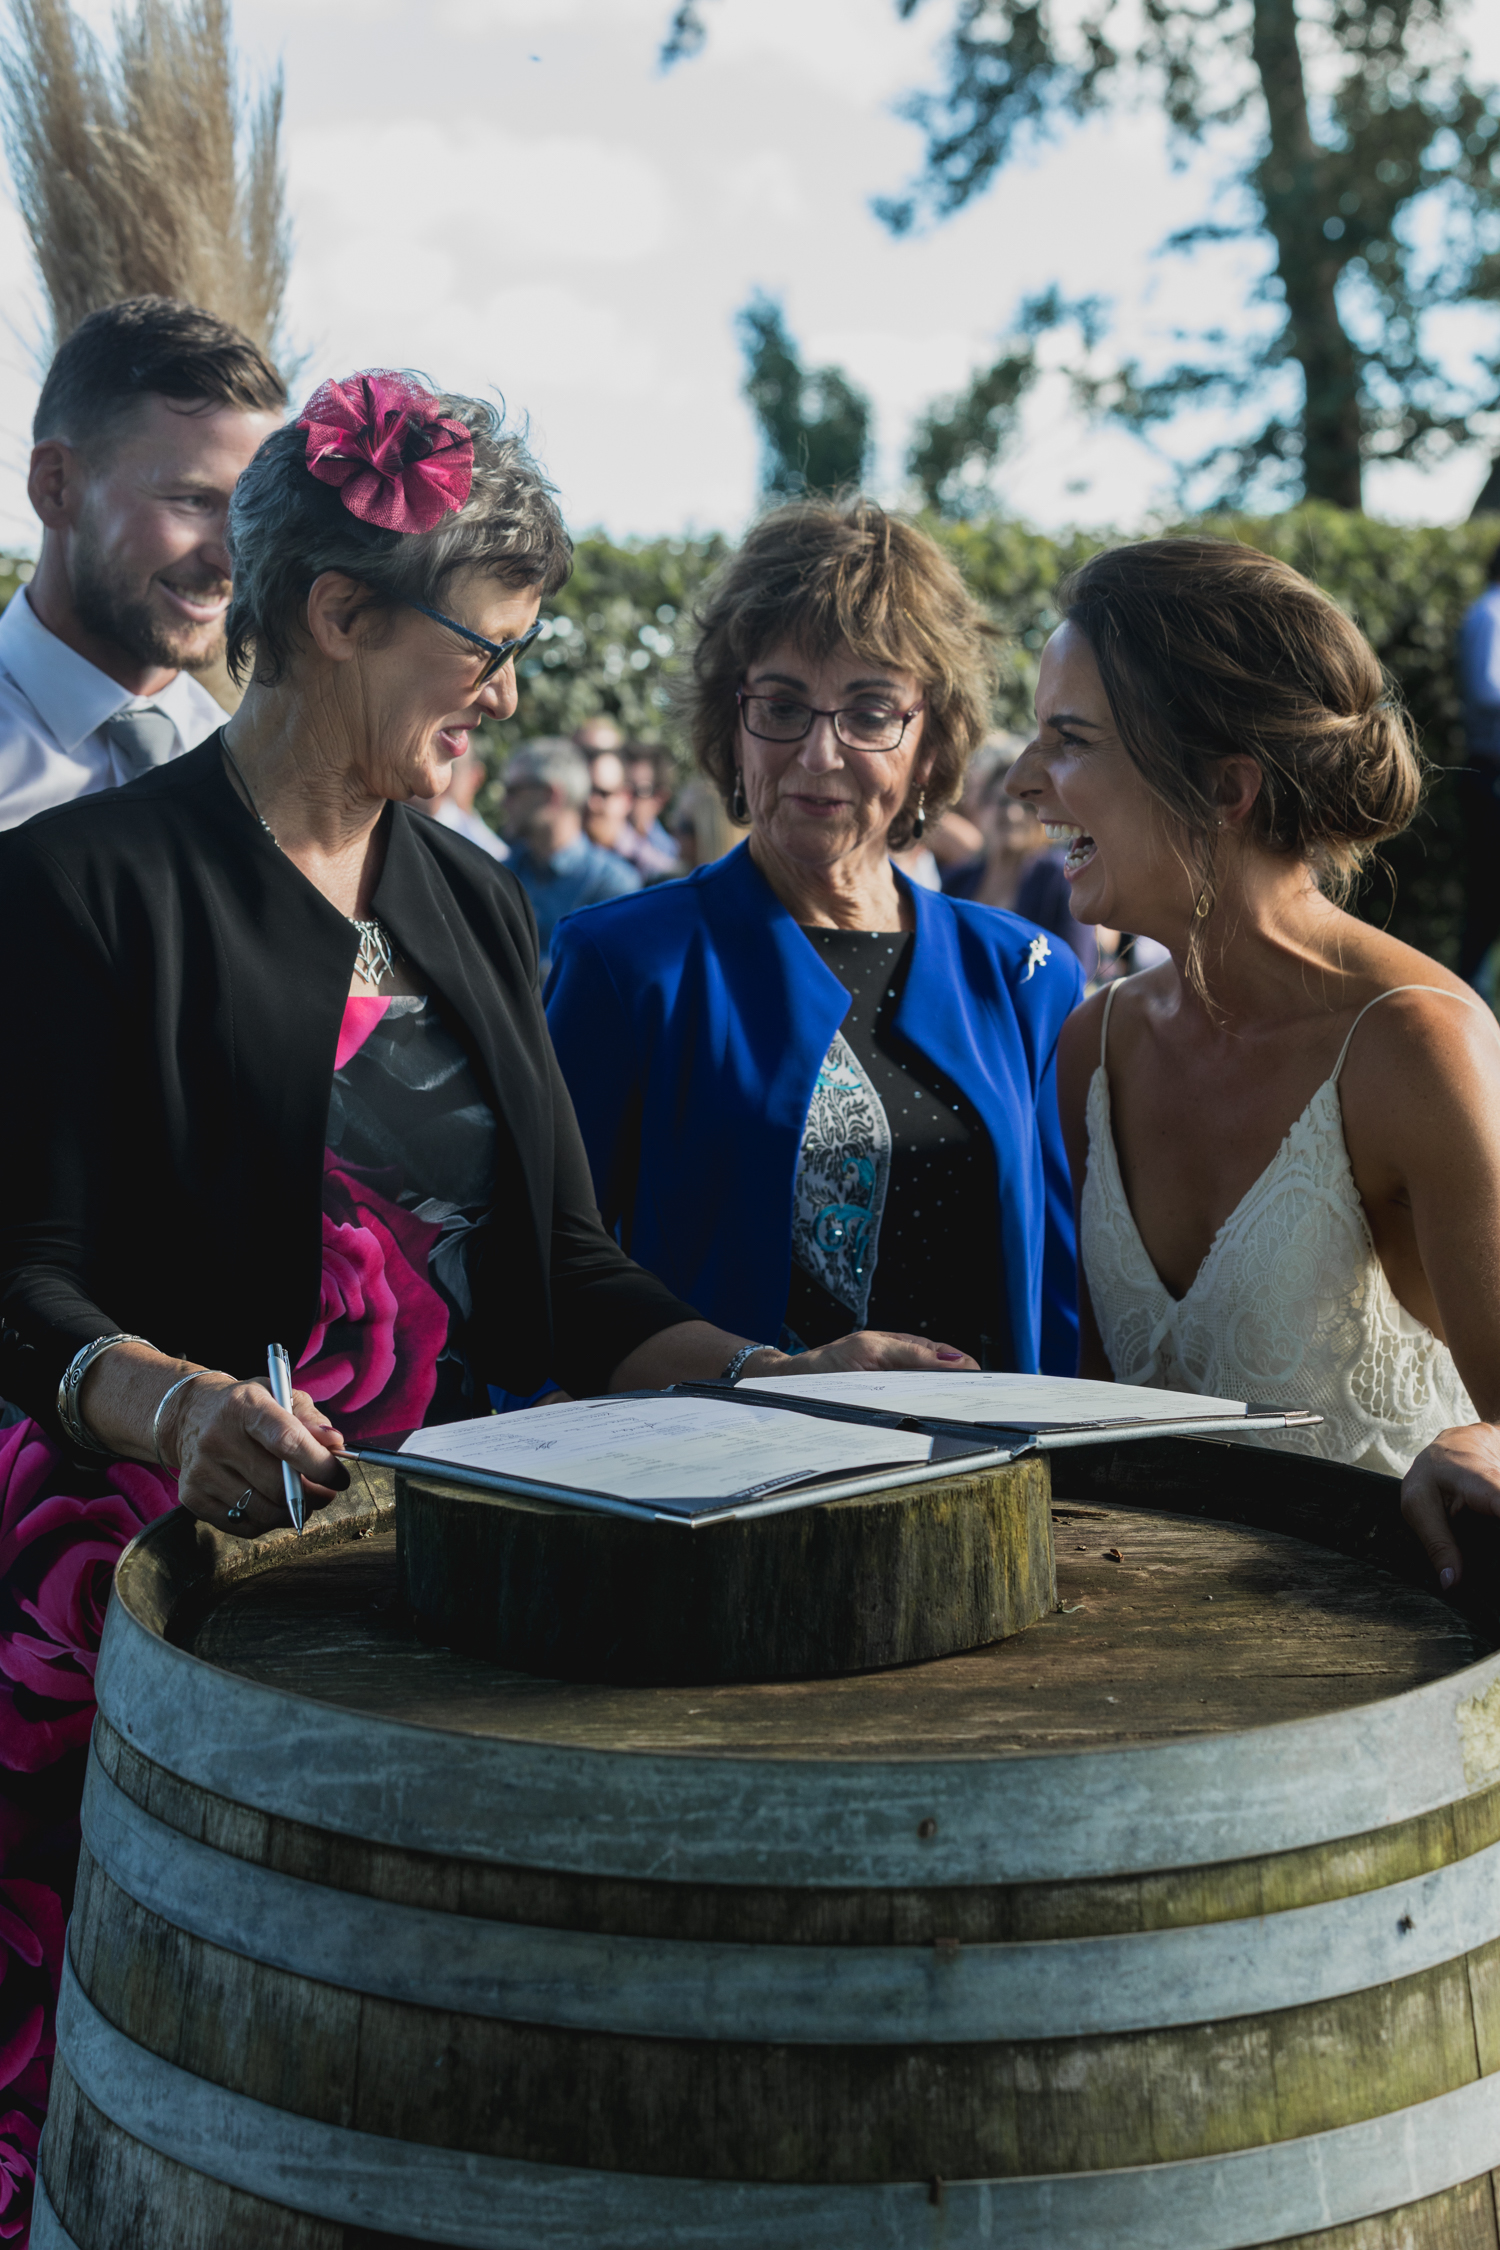 wedding-at-the-red-barn-new-zealand-wedding-photographer-mums-signing-register.jpg